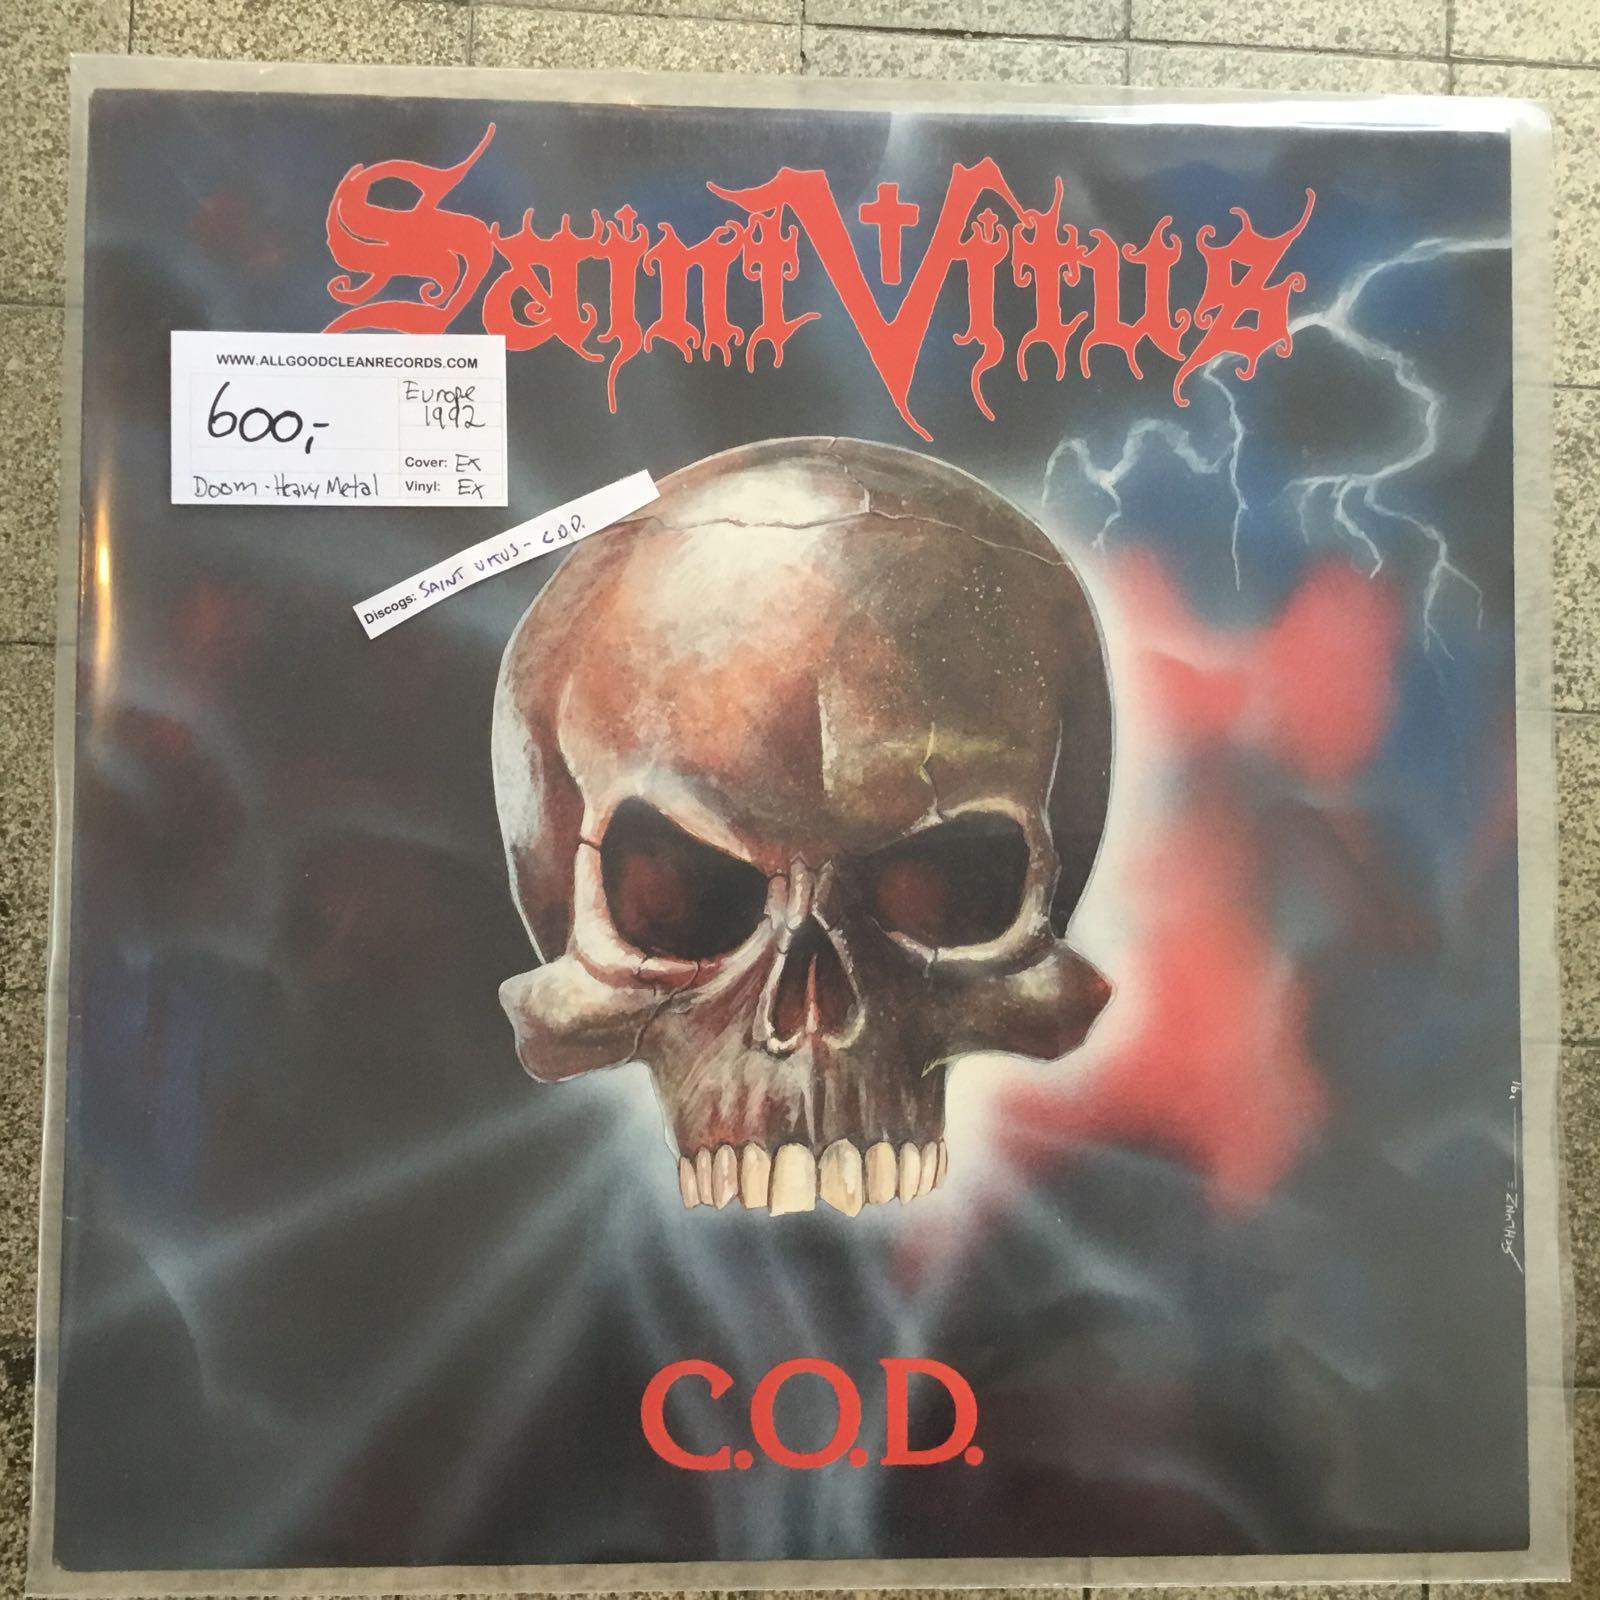 Saint Vitus – C.O.D. [LP] (2. hand)